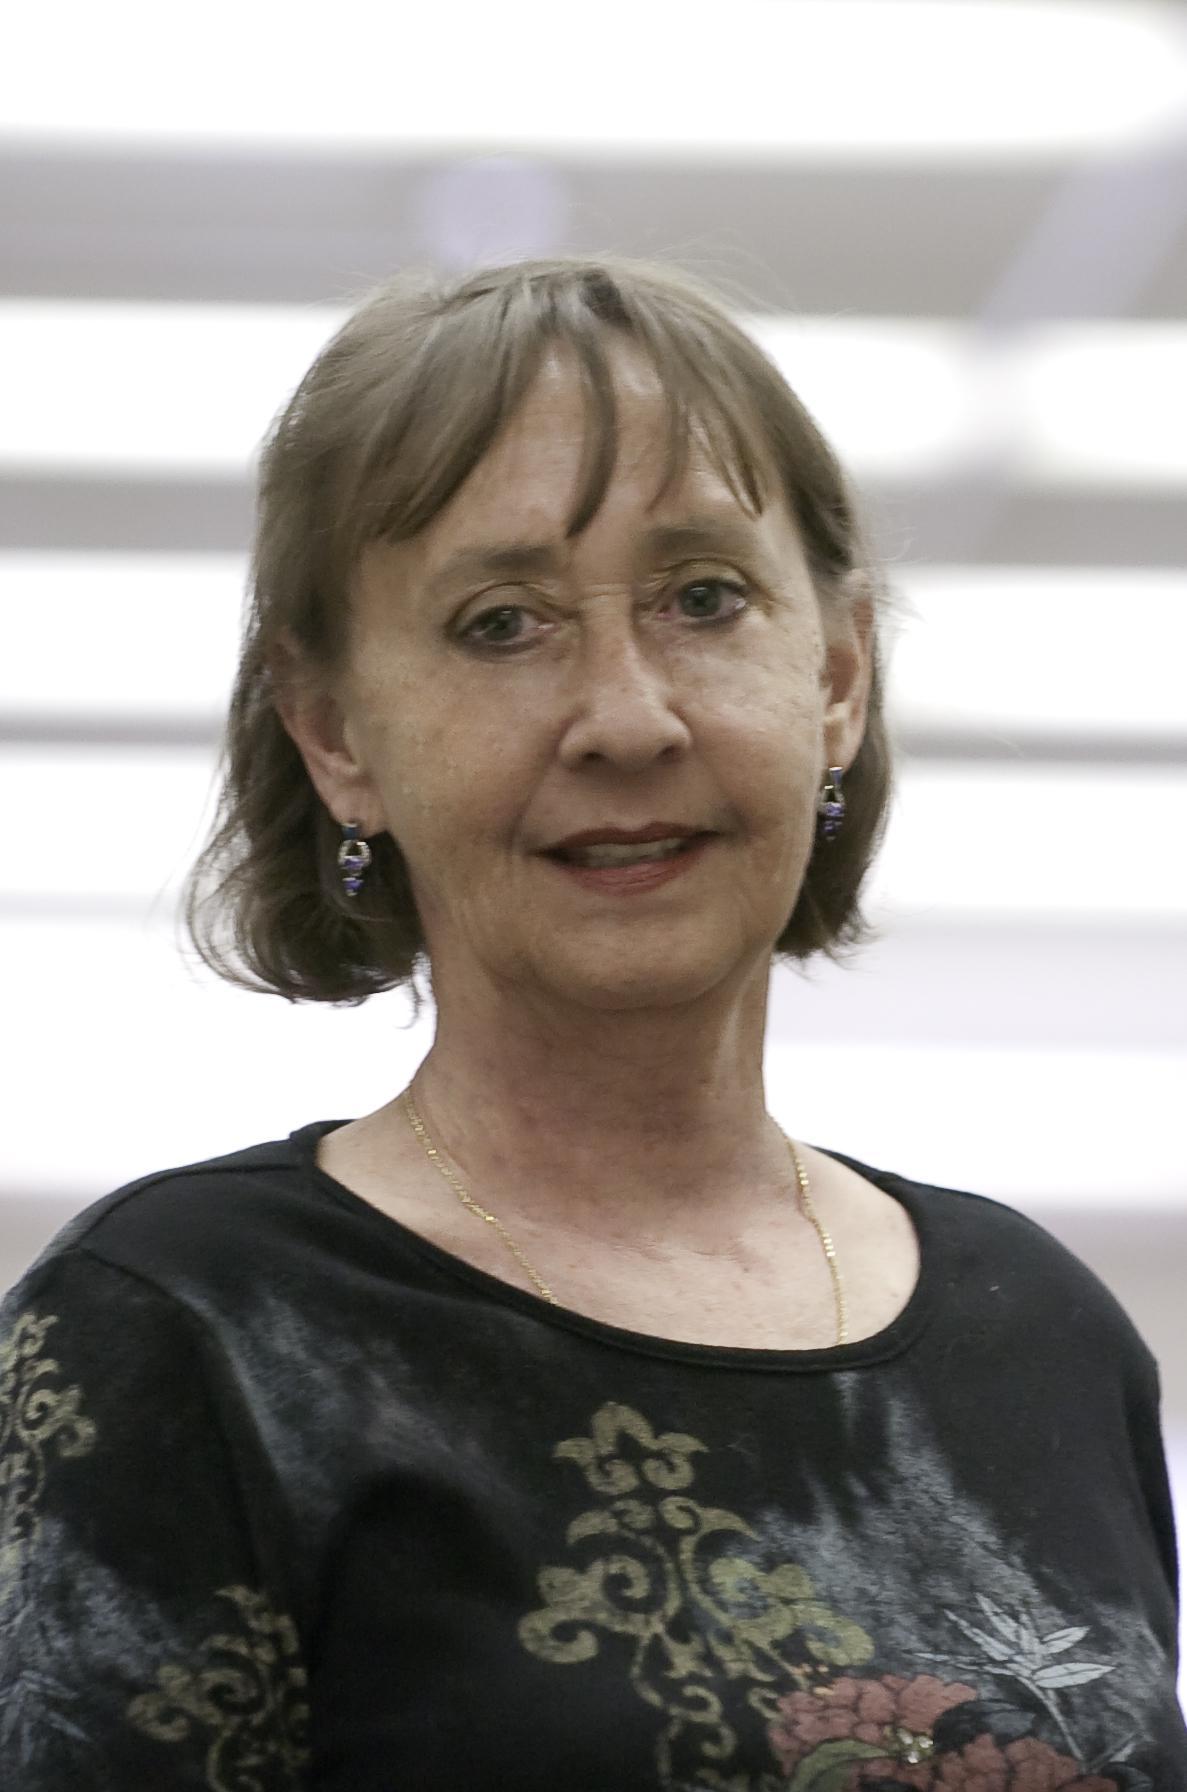 Maud Welzen NED 3 2012, 2014-2015,Sue Jones (actress) Adult gallery Elsie Randolph,Iwa Moto (b. 1988)